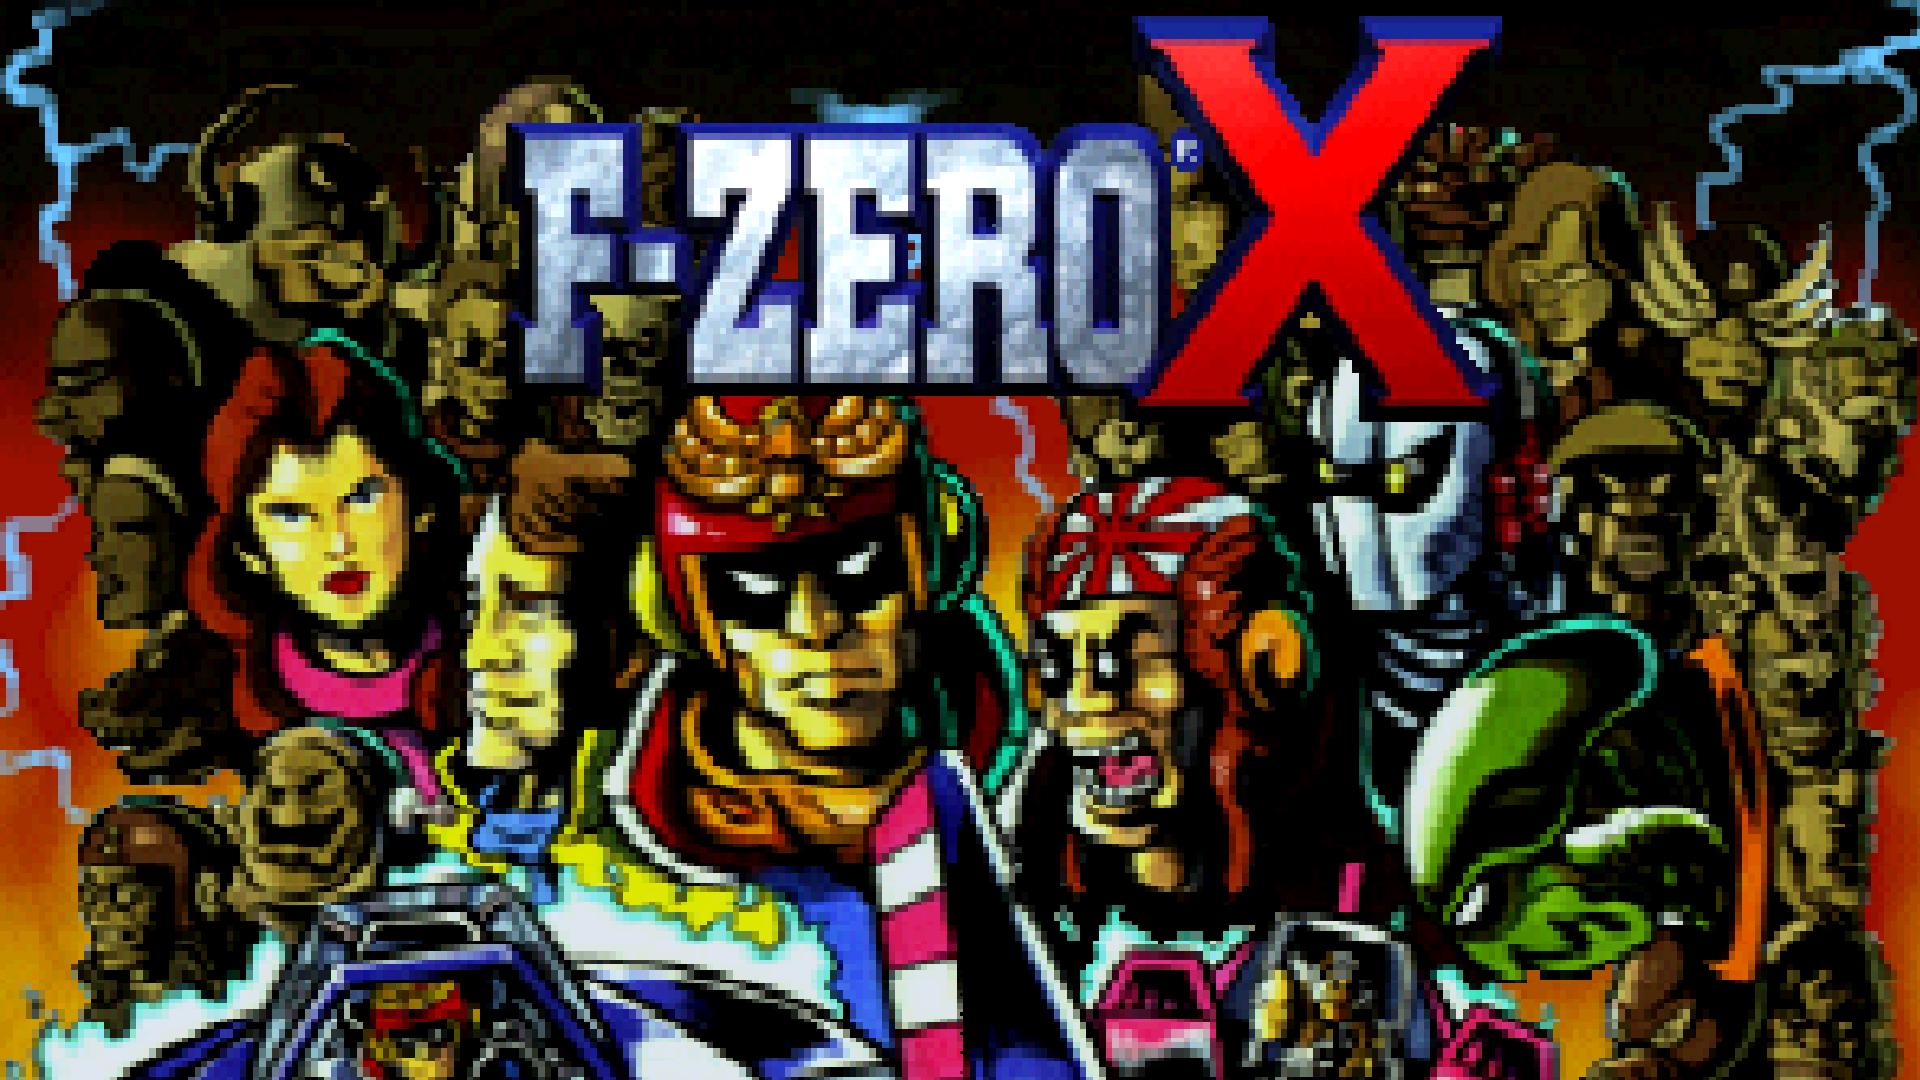 F-Zero X (Wii U) riceve un update che ne risolve alcuni problemi